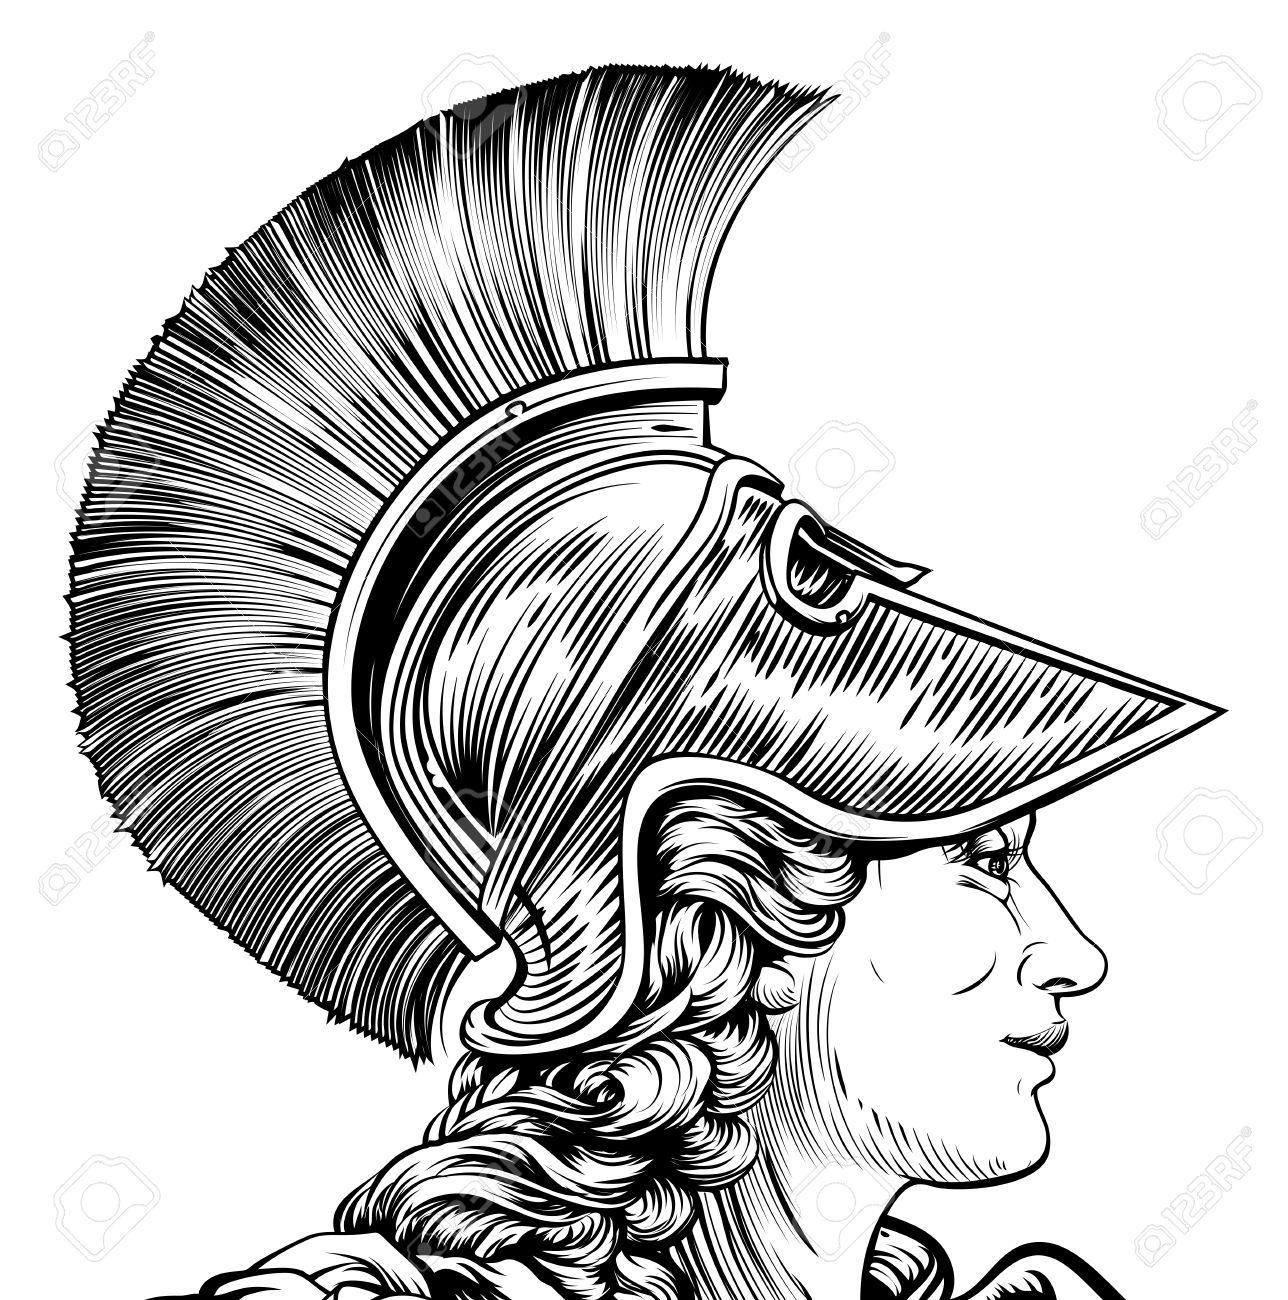 Kingdom of god clipart svg free stock 160 Kingdom Of God Cliparts, Stock Vector And Royalty Free Kingdom ... svg free stock